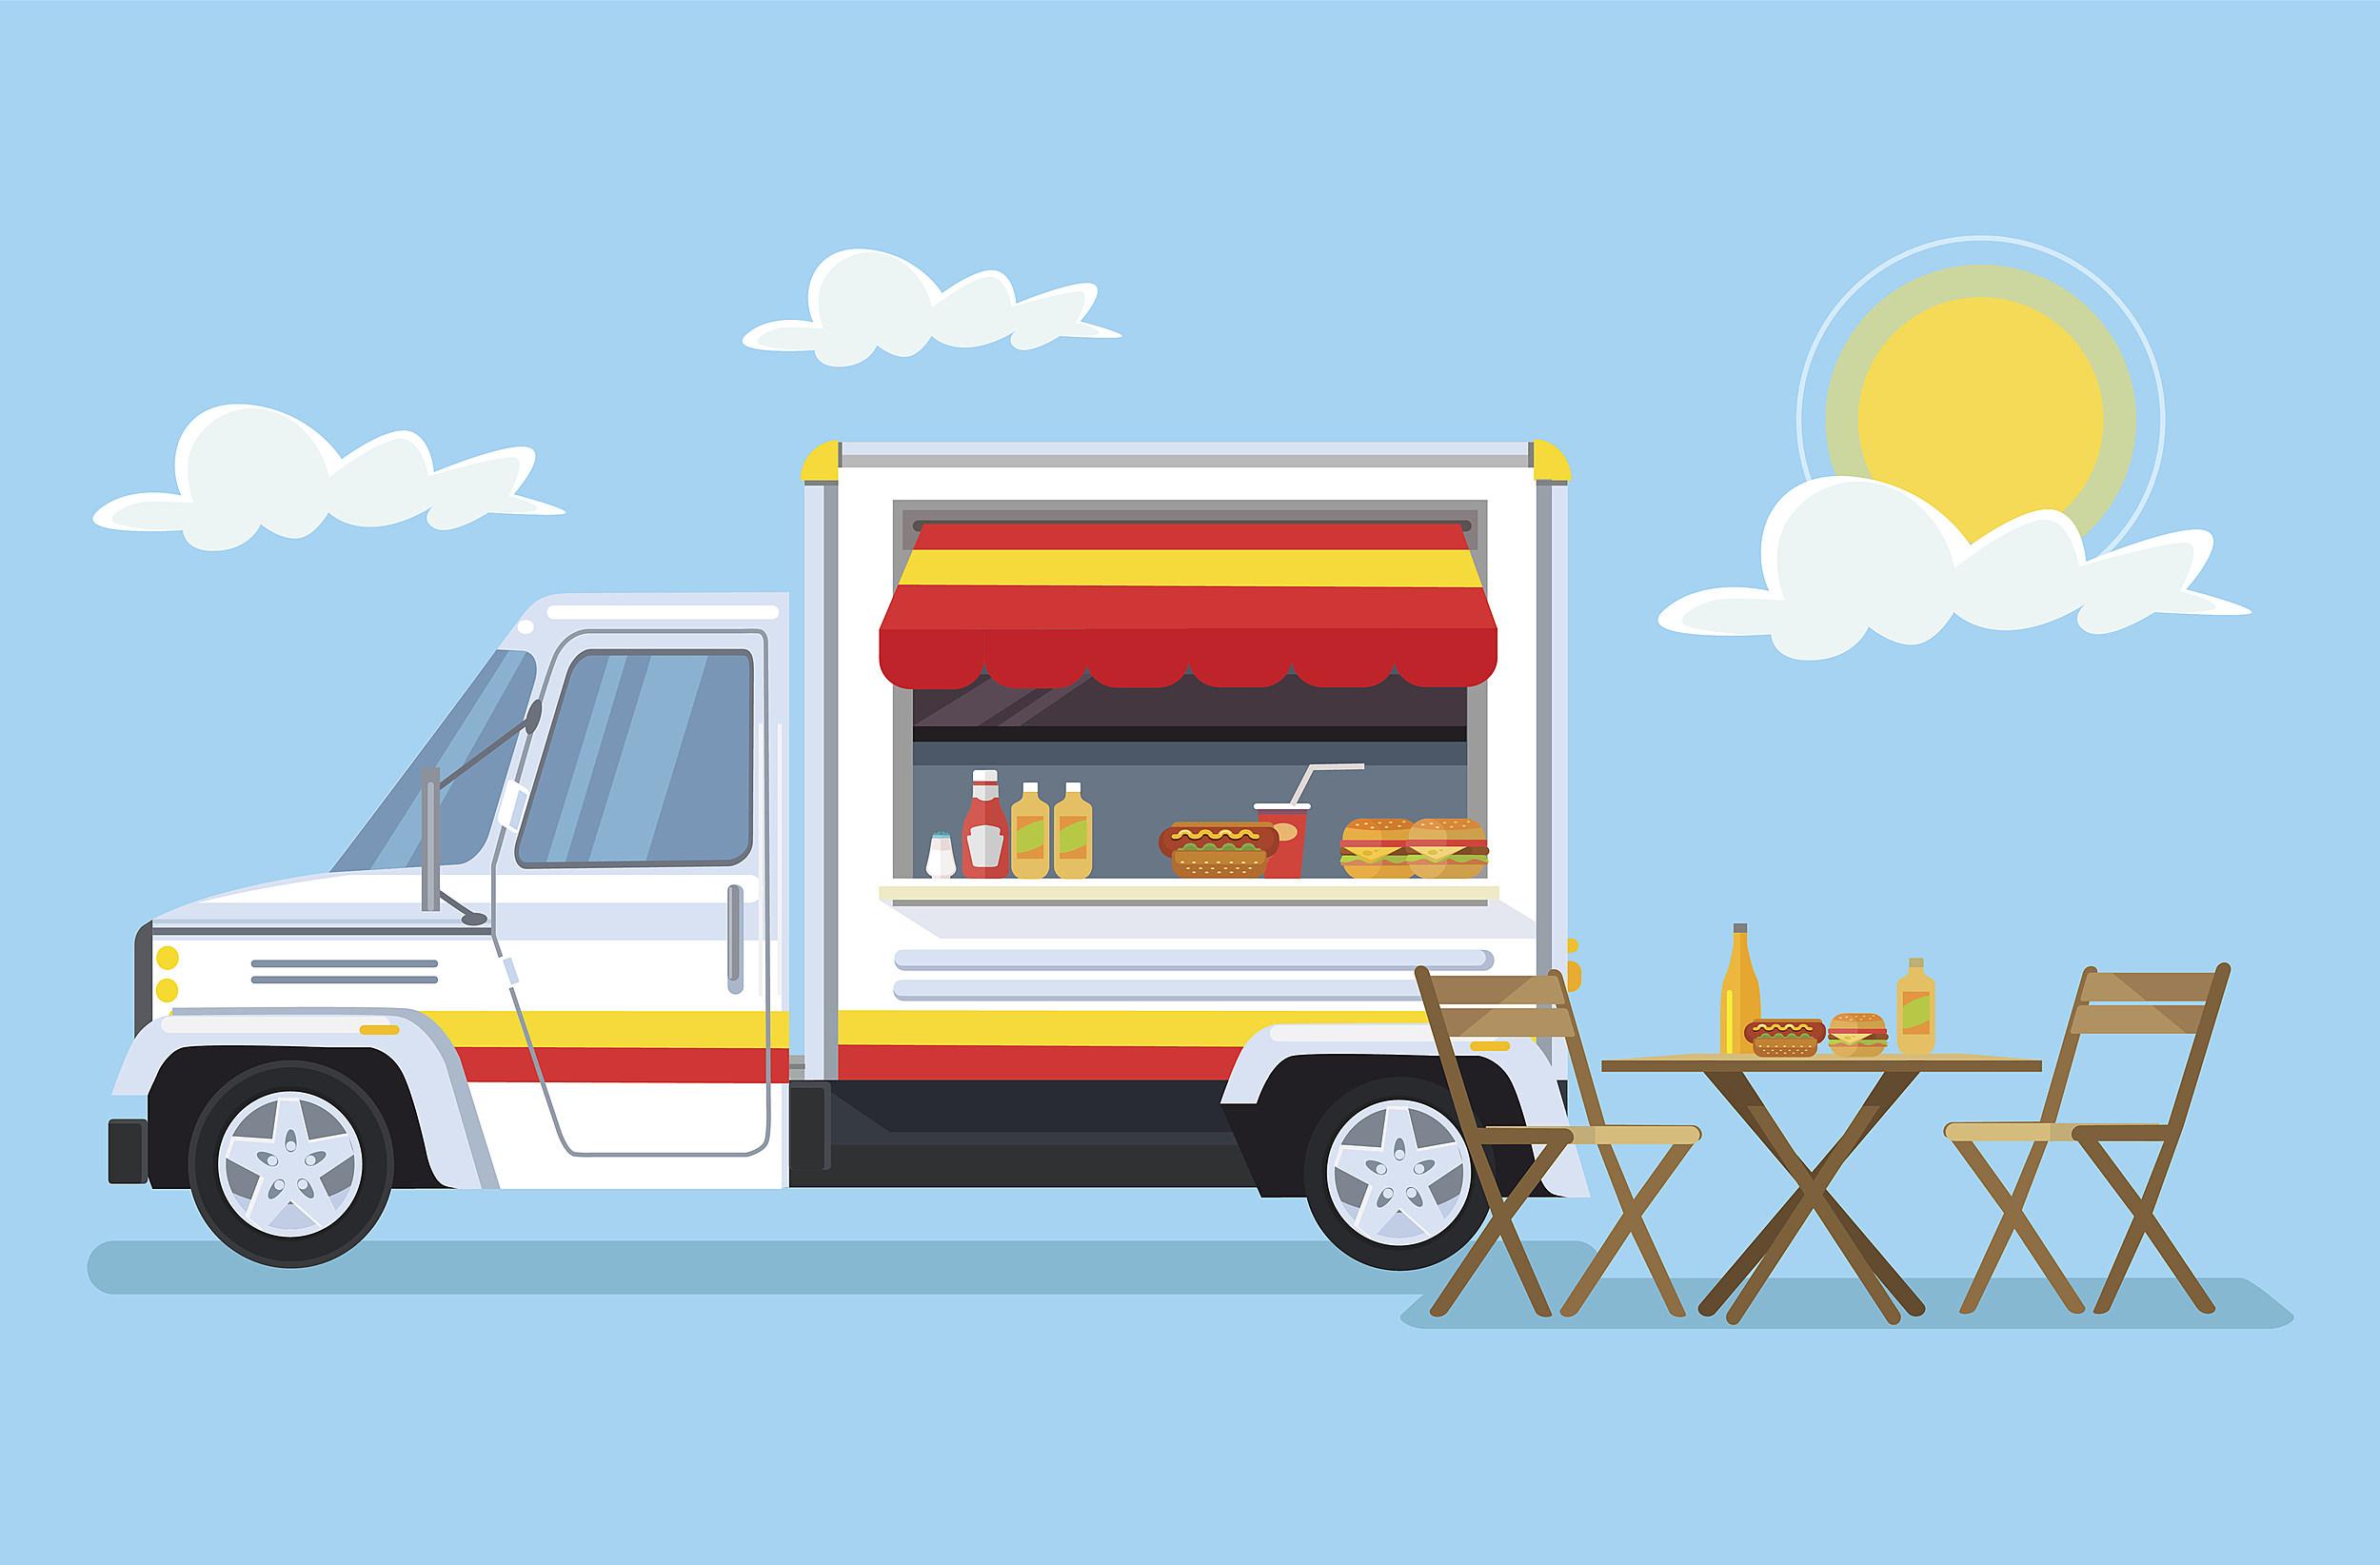 Street food car. Vector flat cartoon illustration